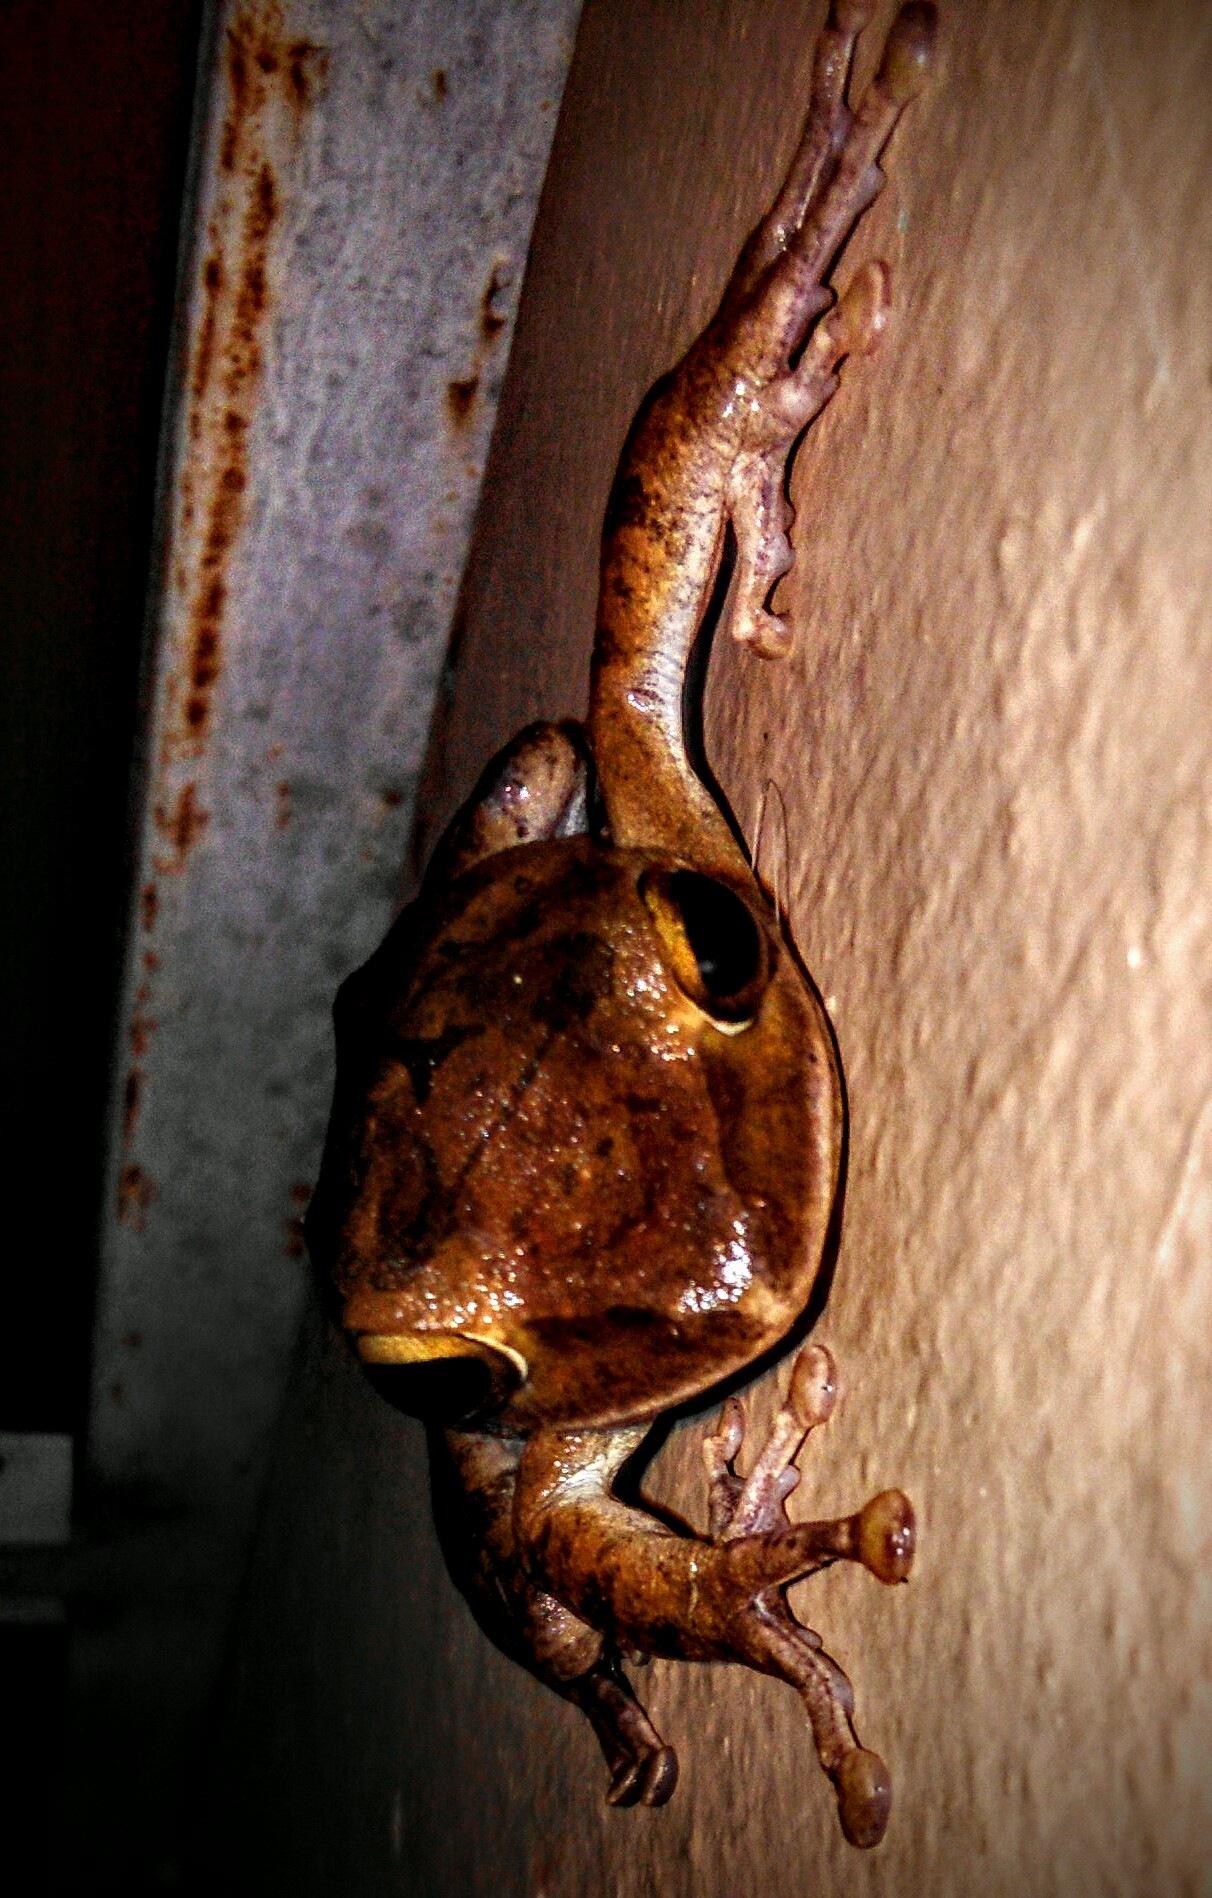 Frog by Wongphakdee